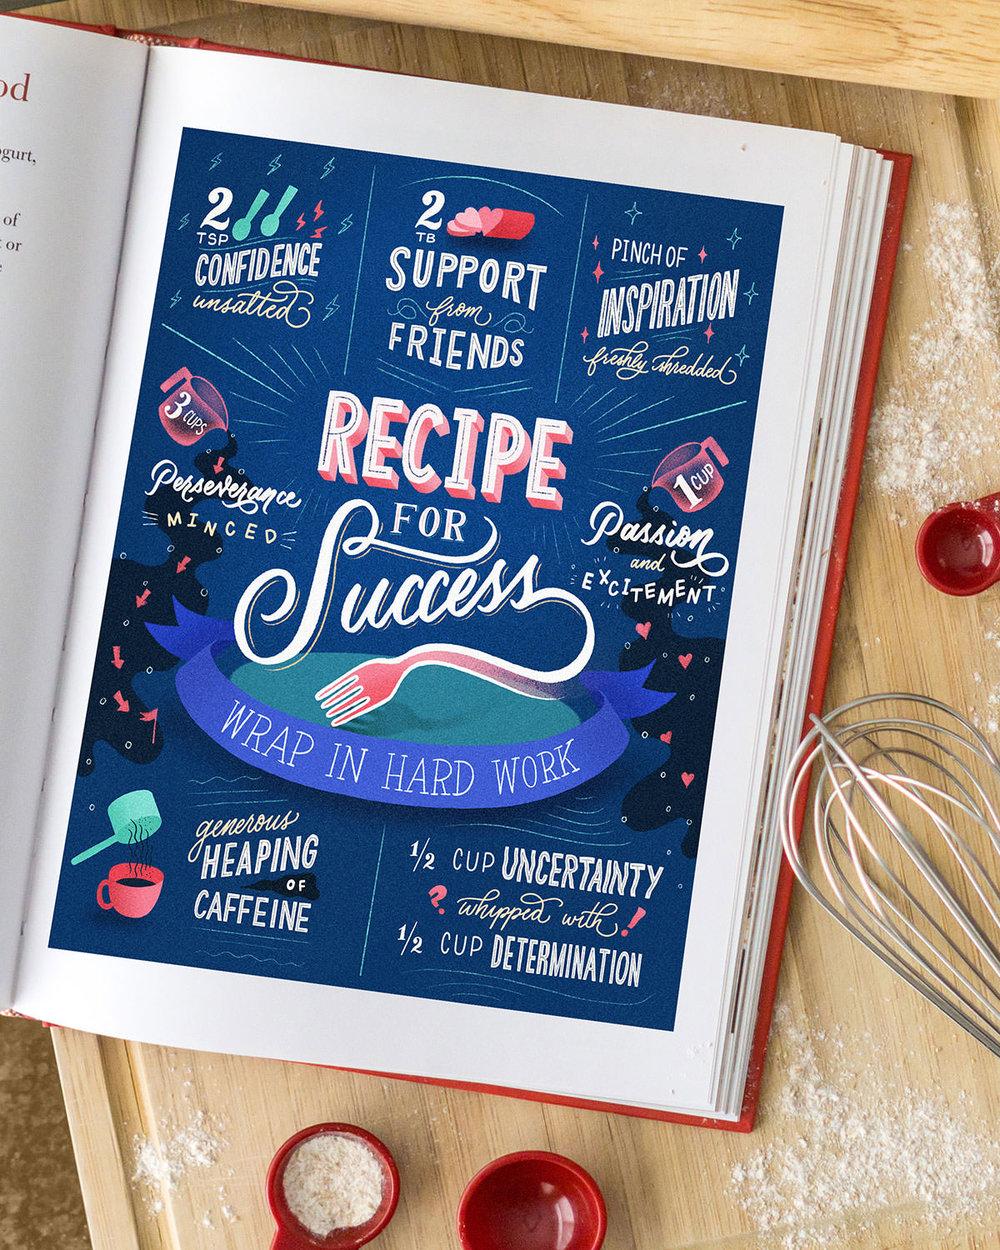 recipe-for-success-lettering-cookbook-mockup